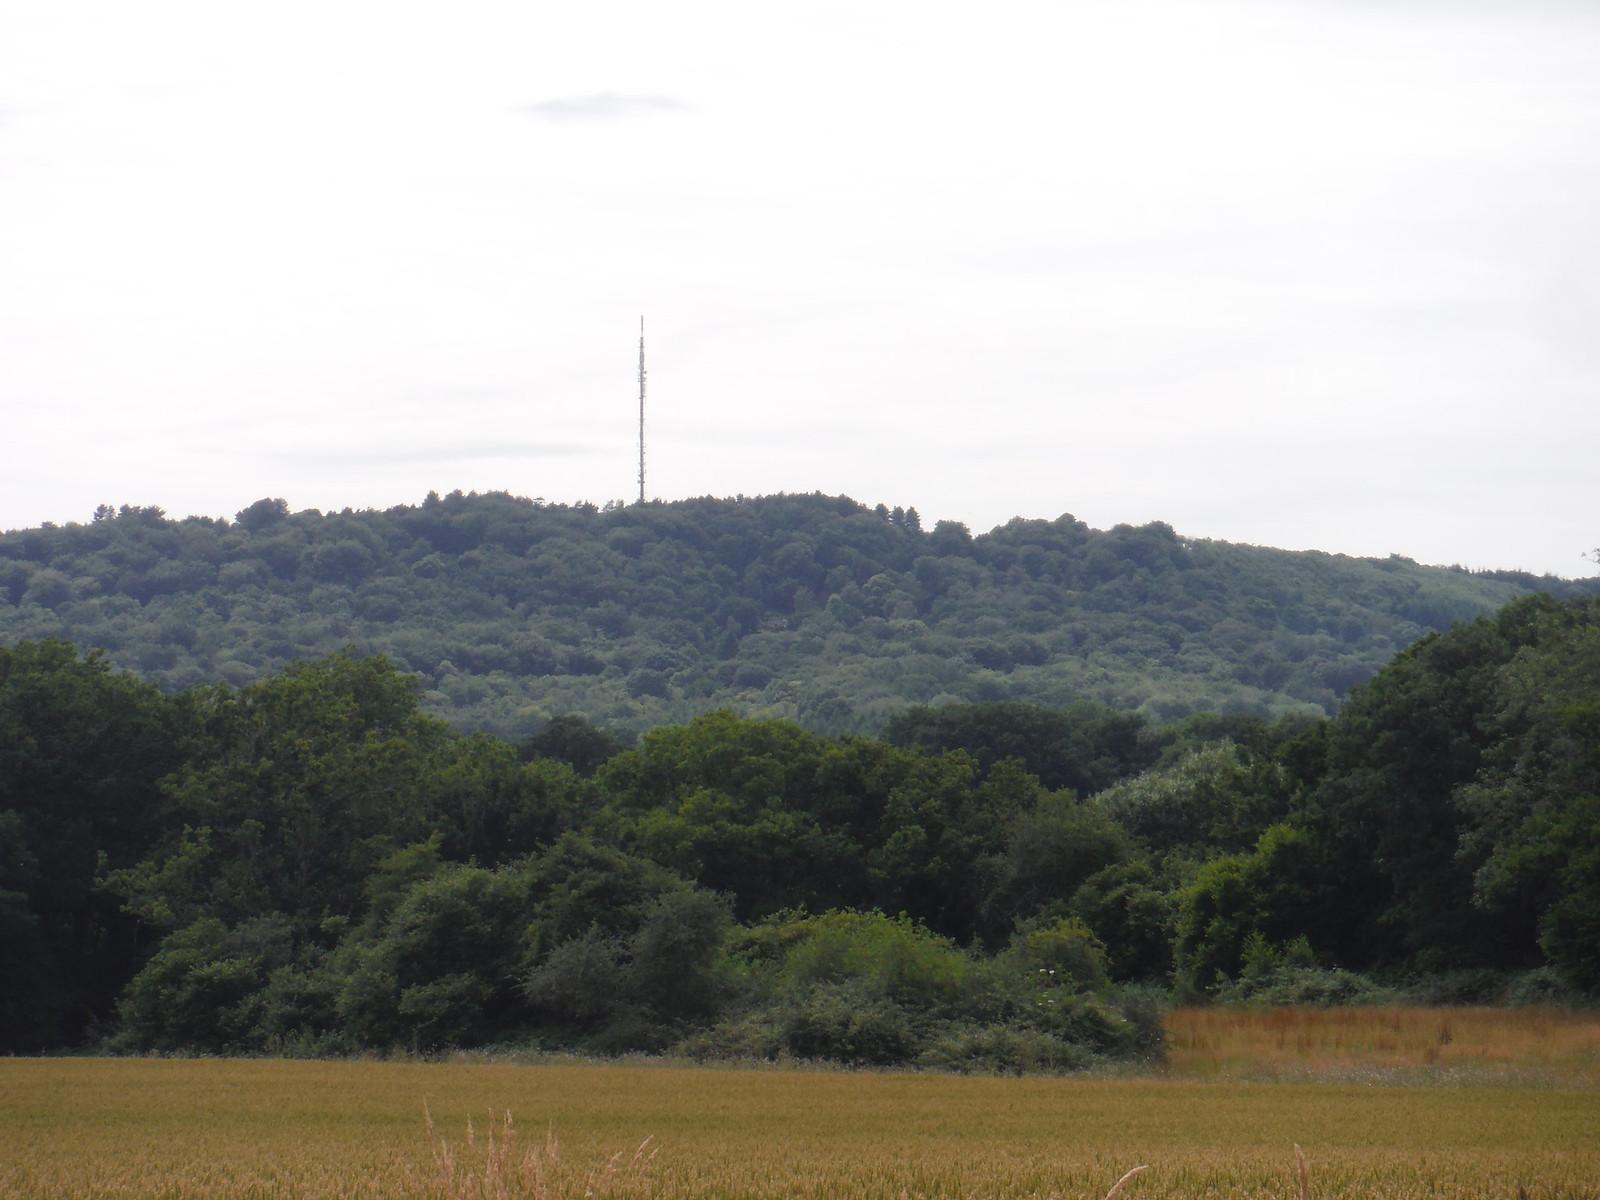 Bexleyhill SWC Walk 48 Haslemere to Midhurst (via Lurgashall or Lickfold)